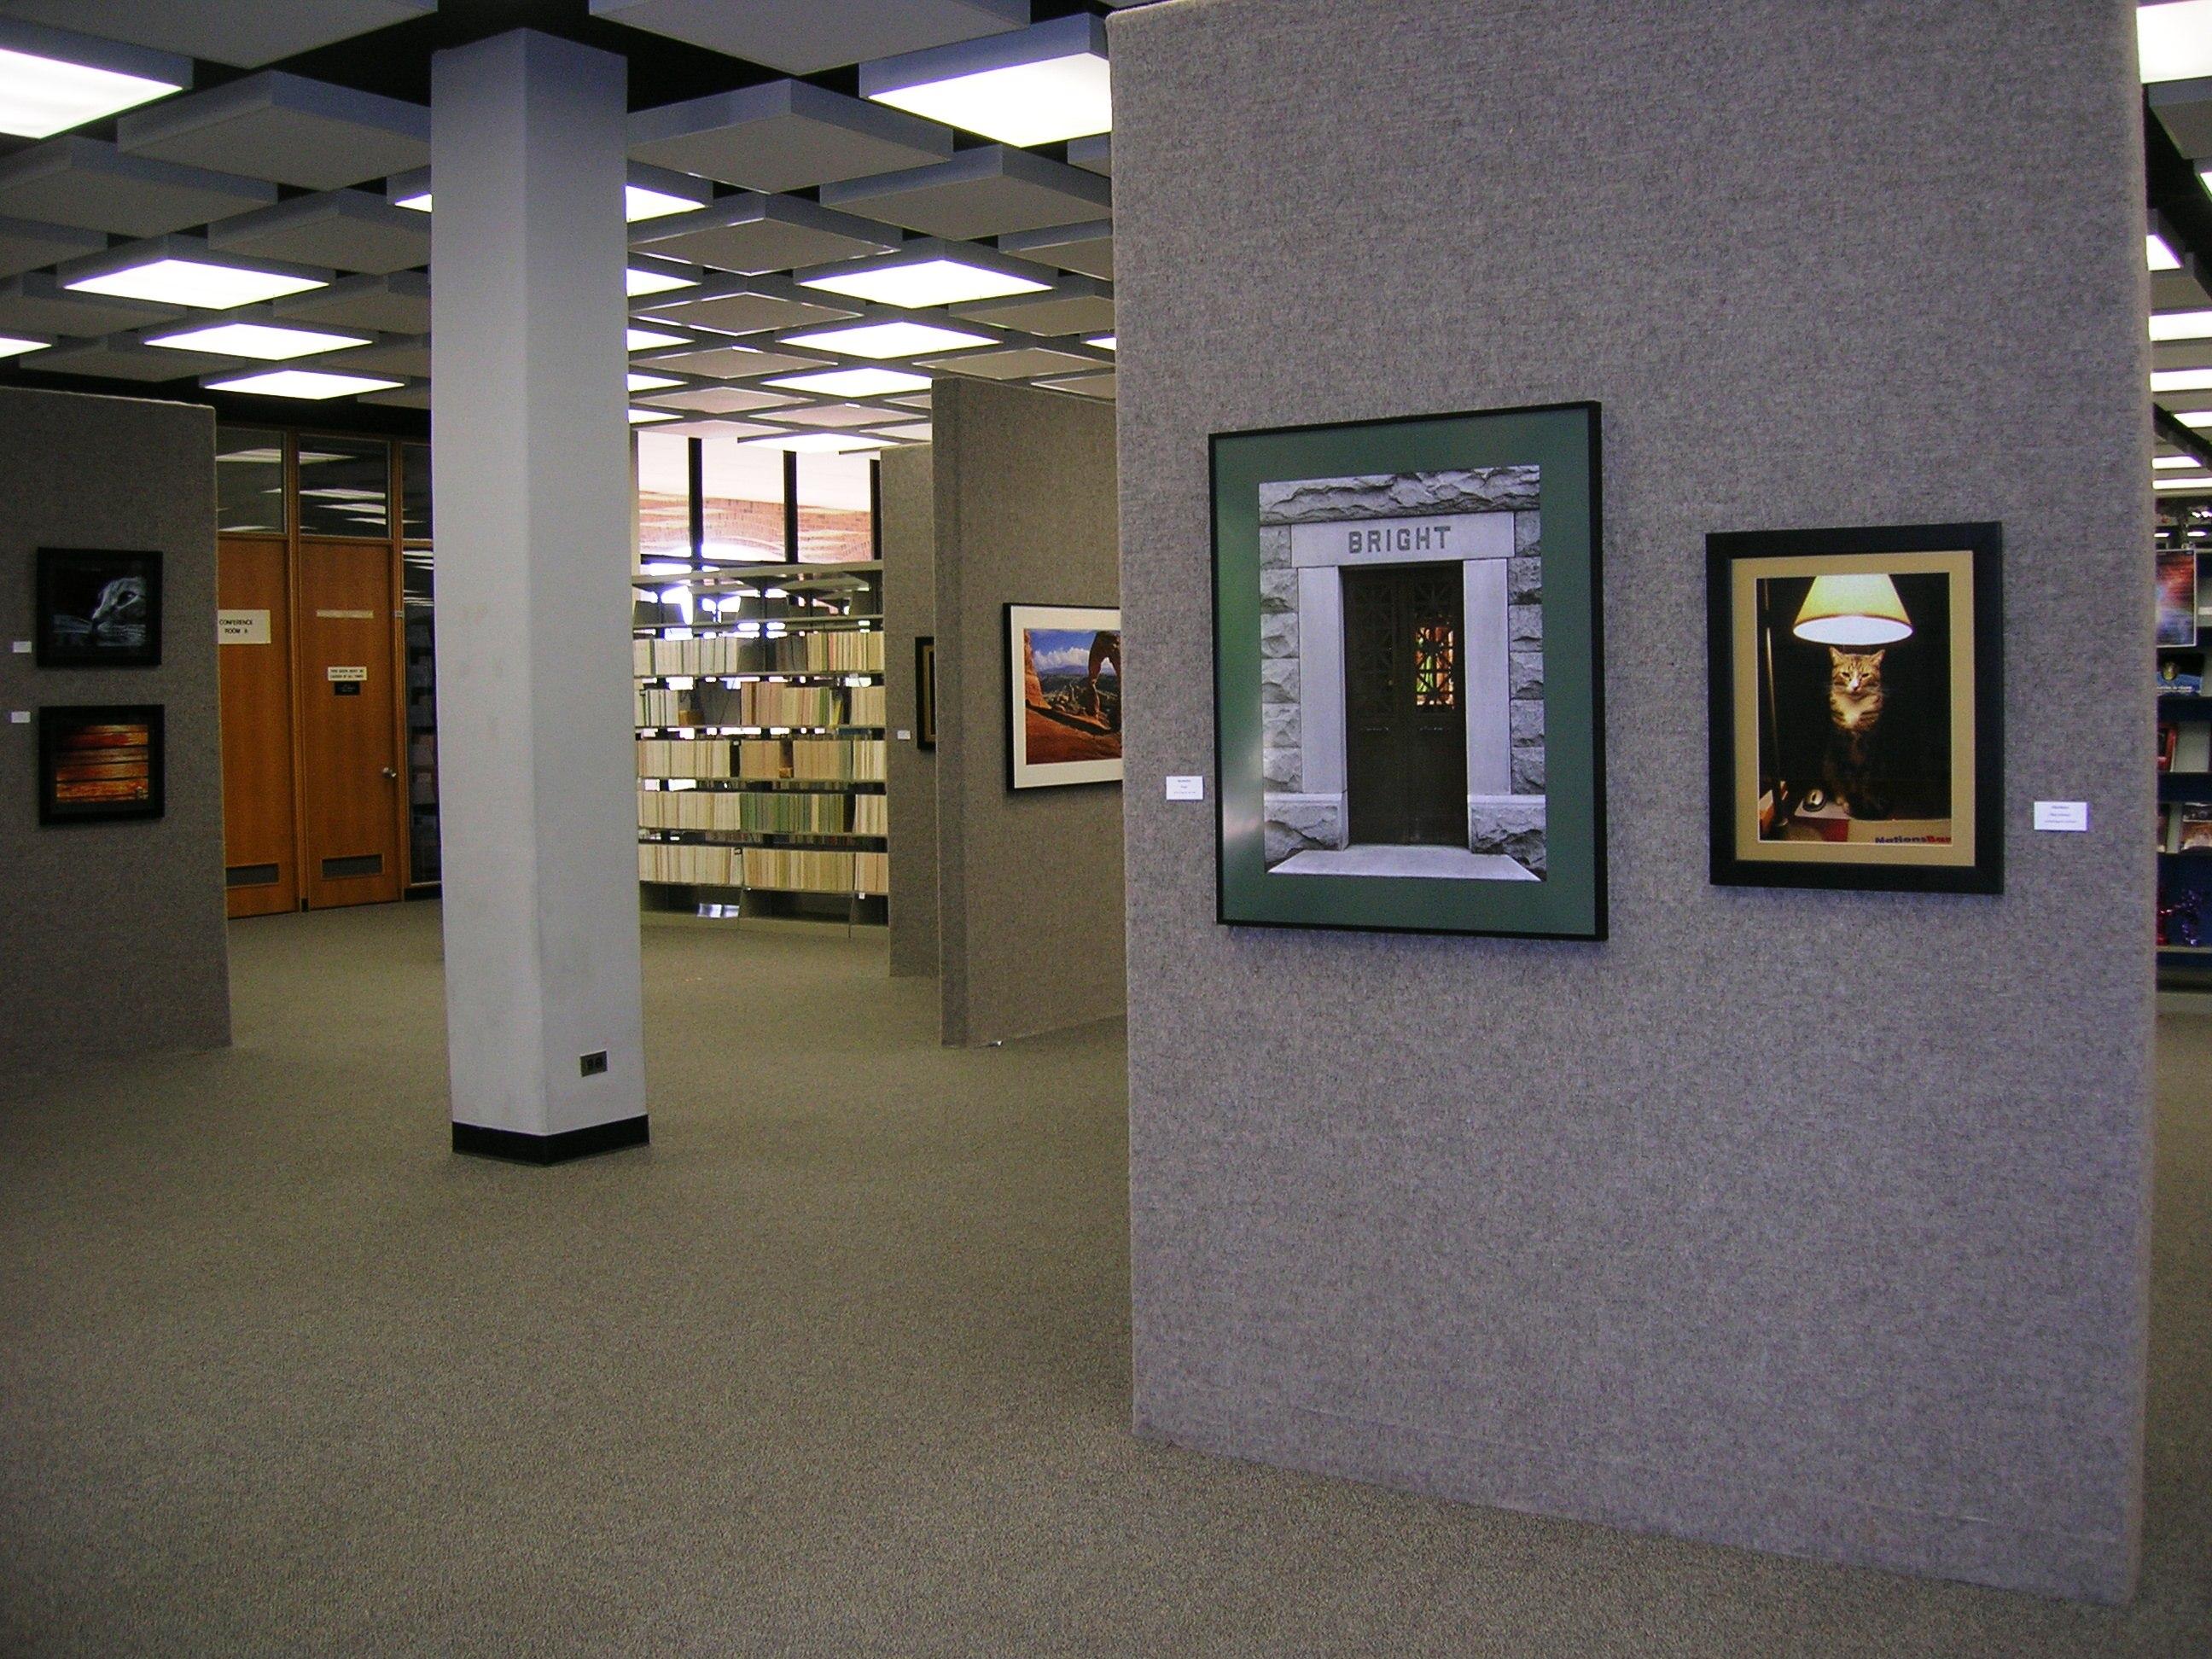 Art Exhibit area